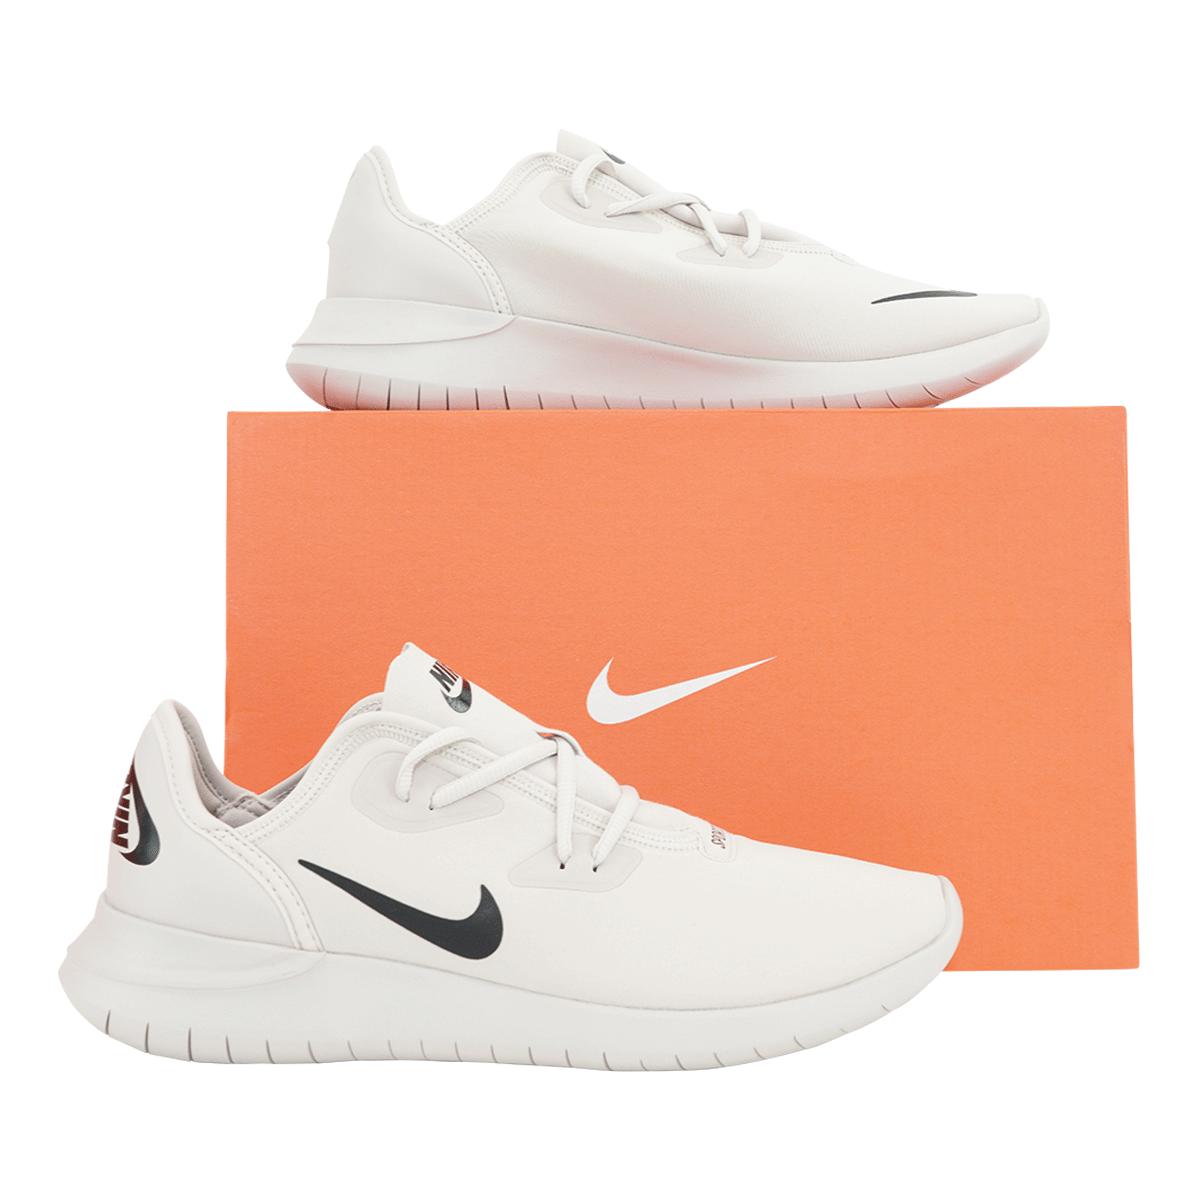 Nike-Men-039-s-Hakata-Running-Shoes thumbnail 17